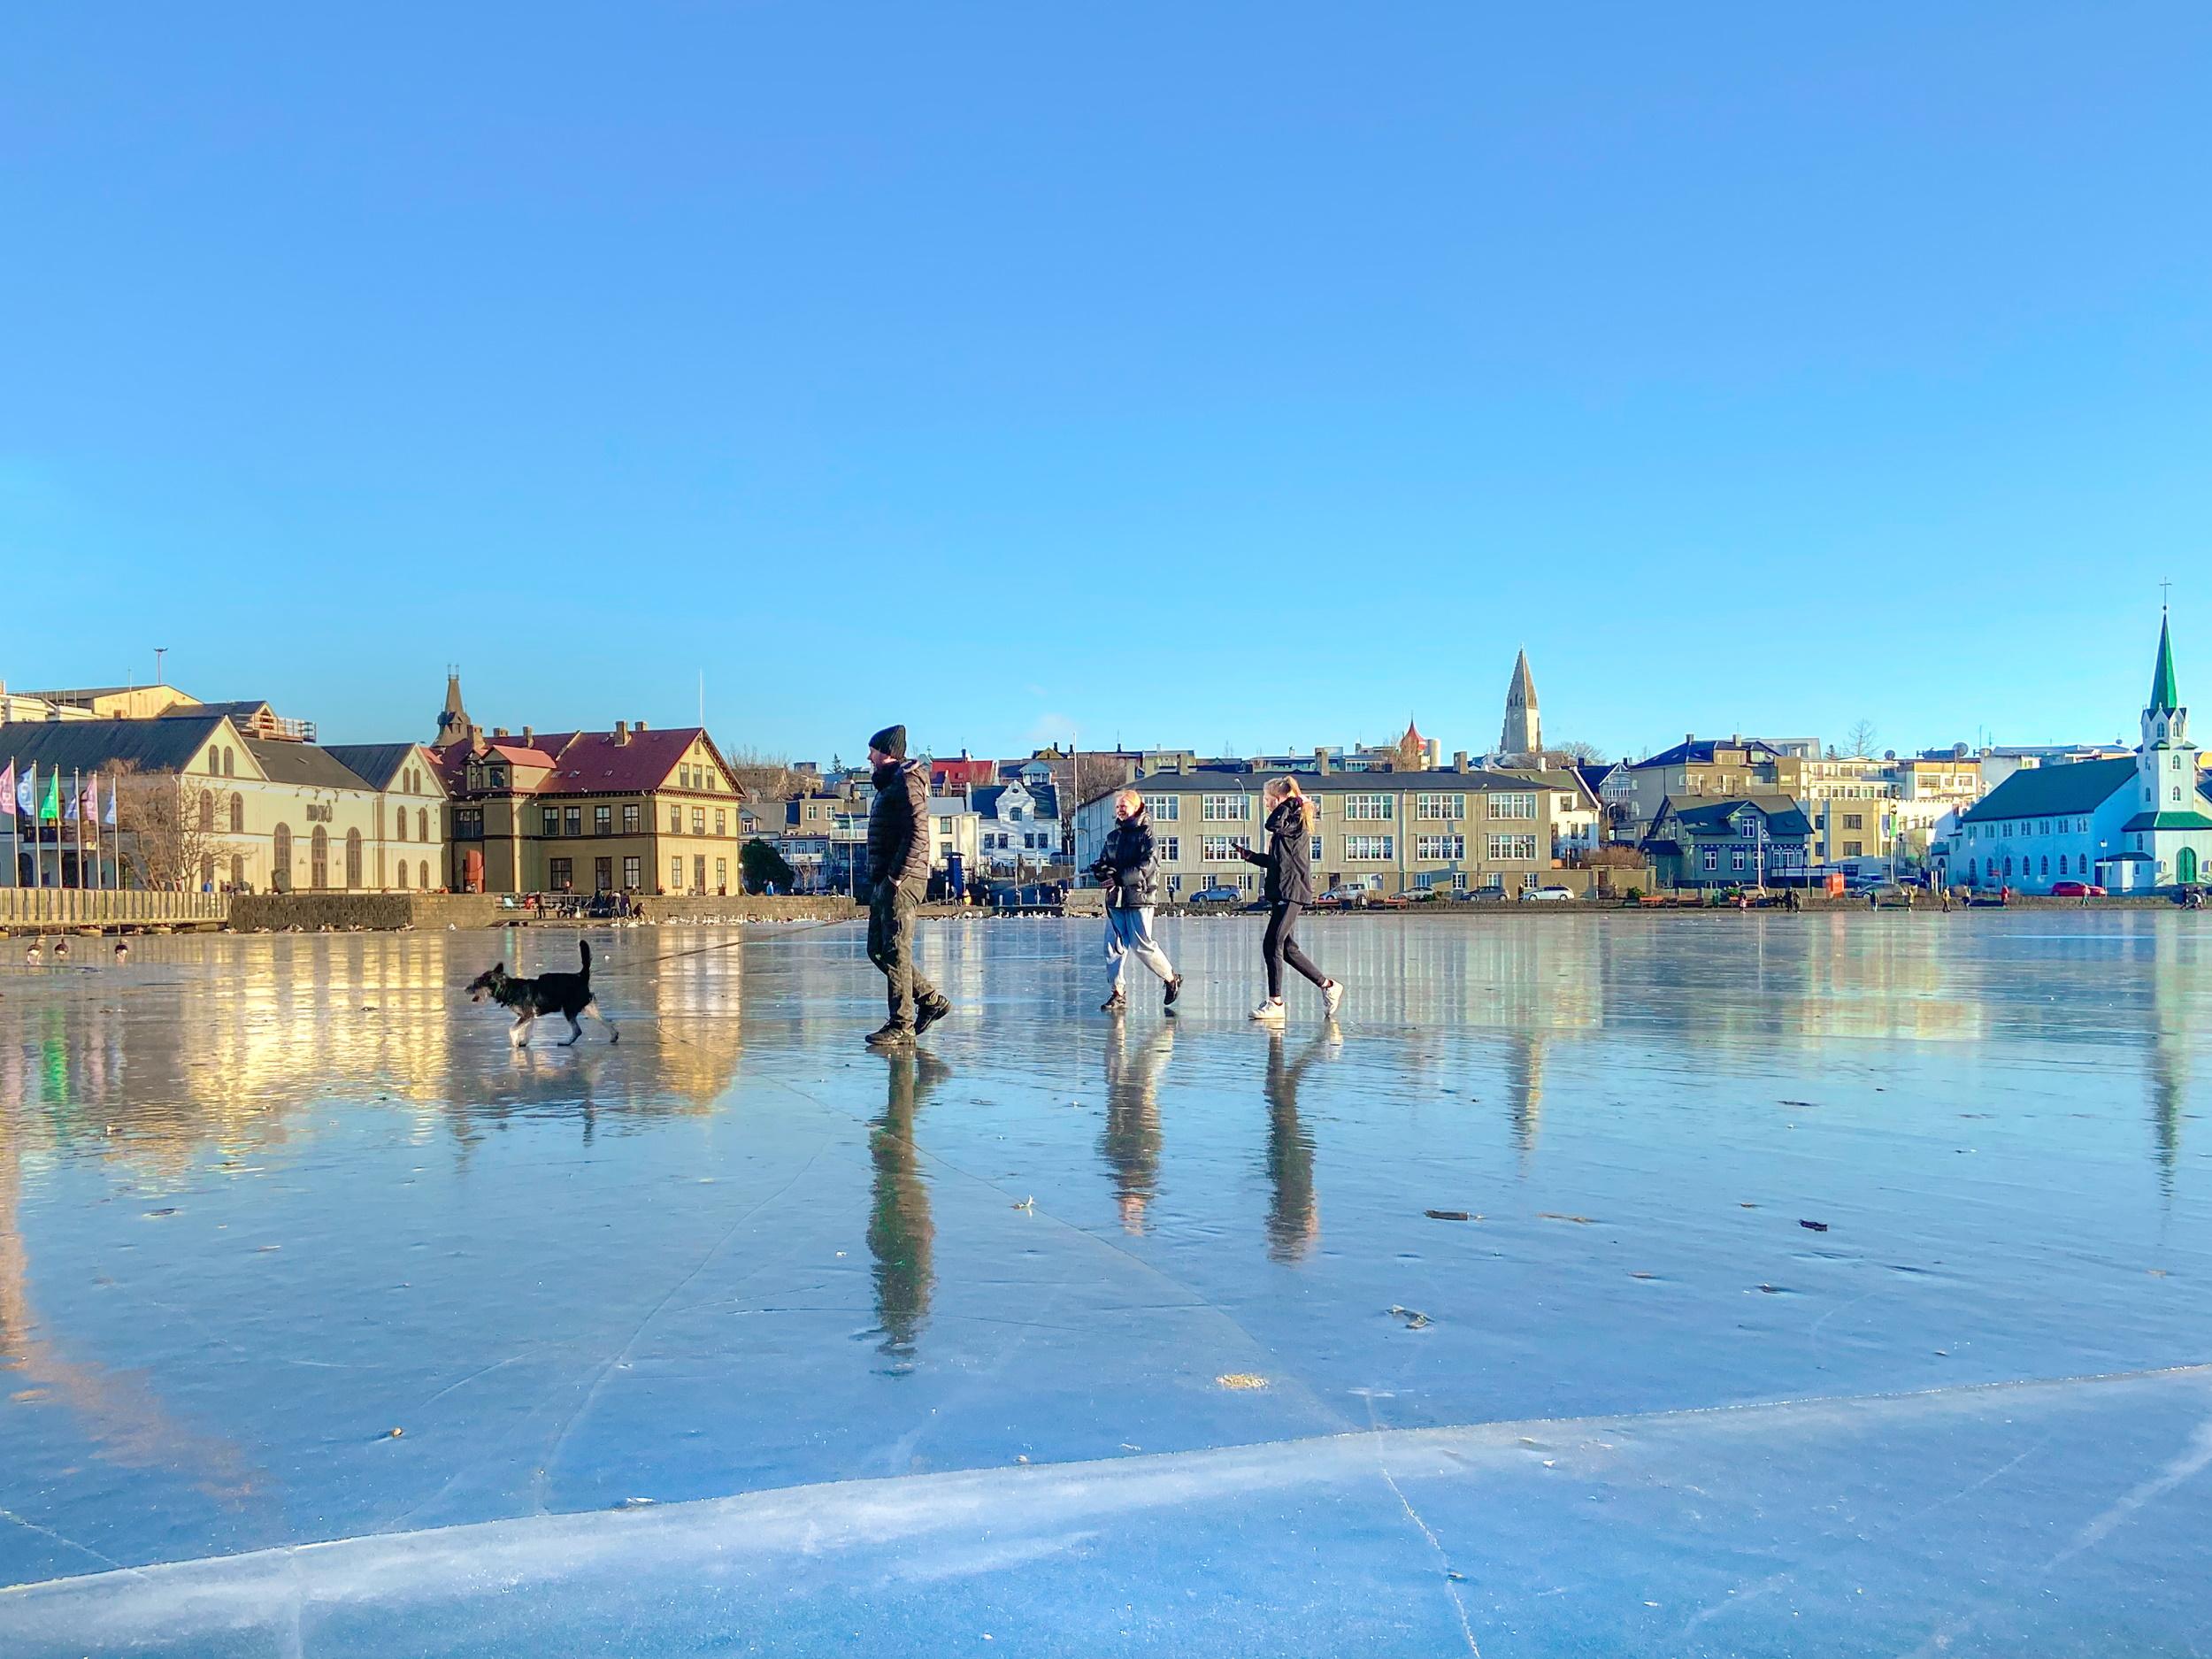 People walking on Reykjavik pond in winter